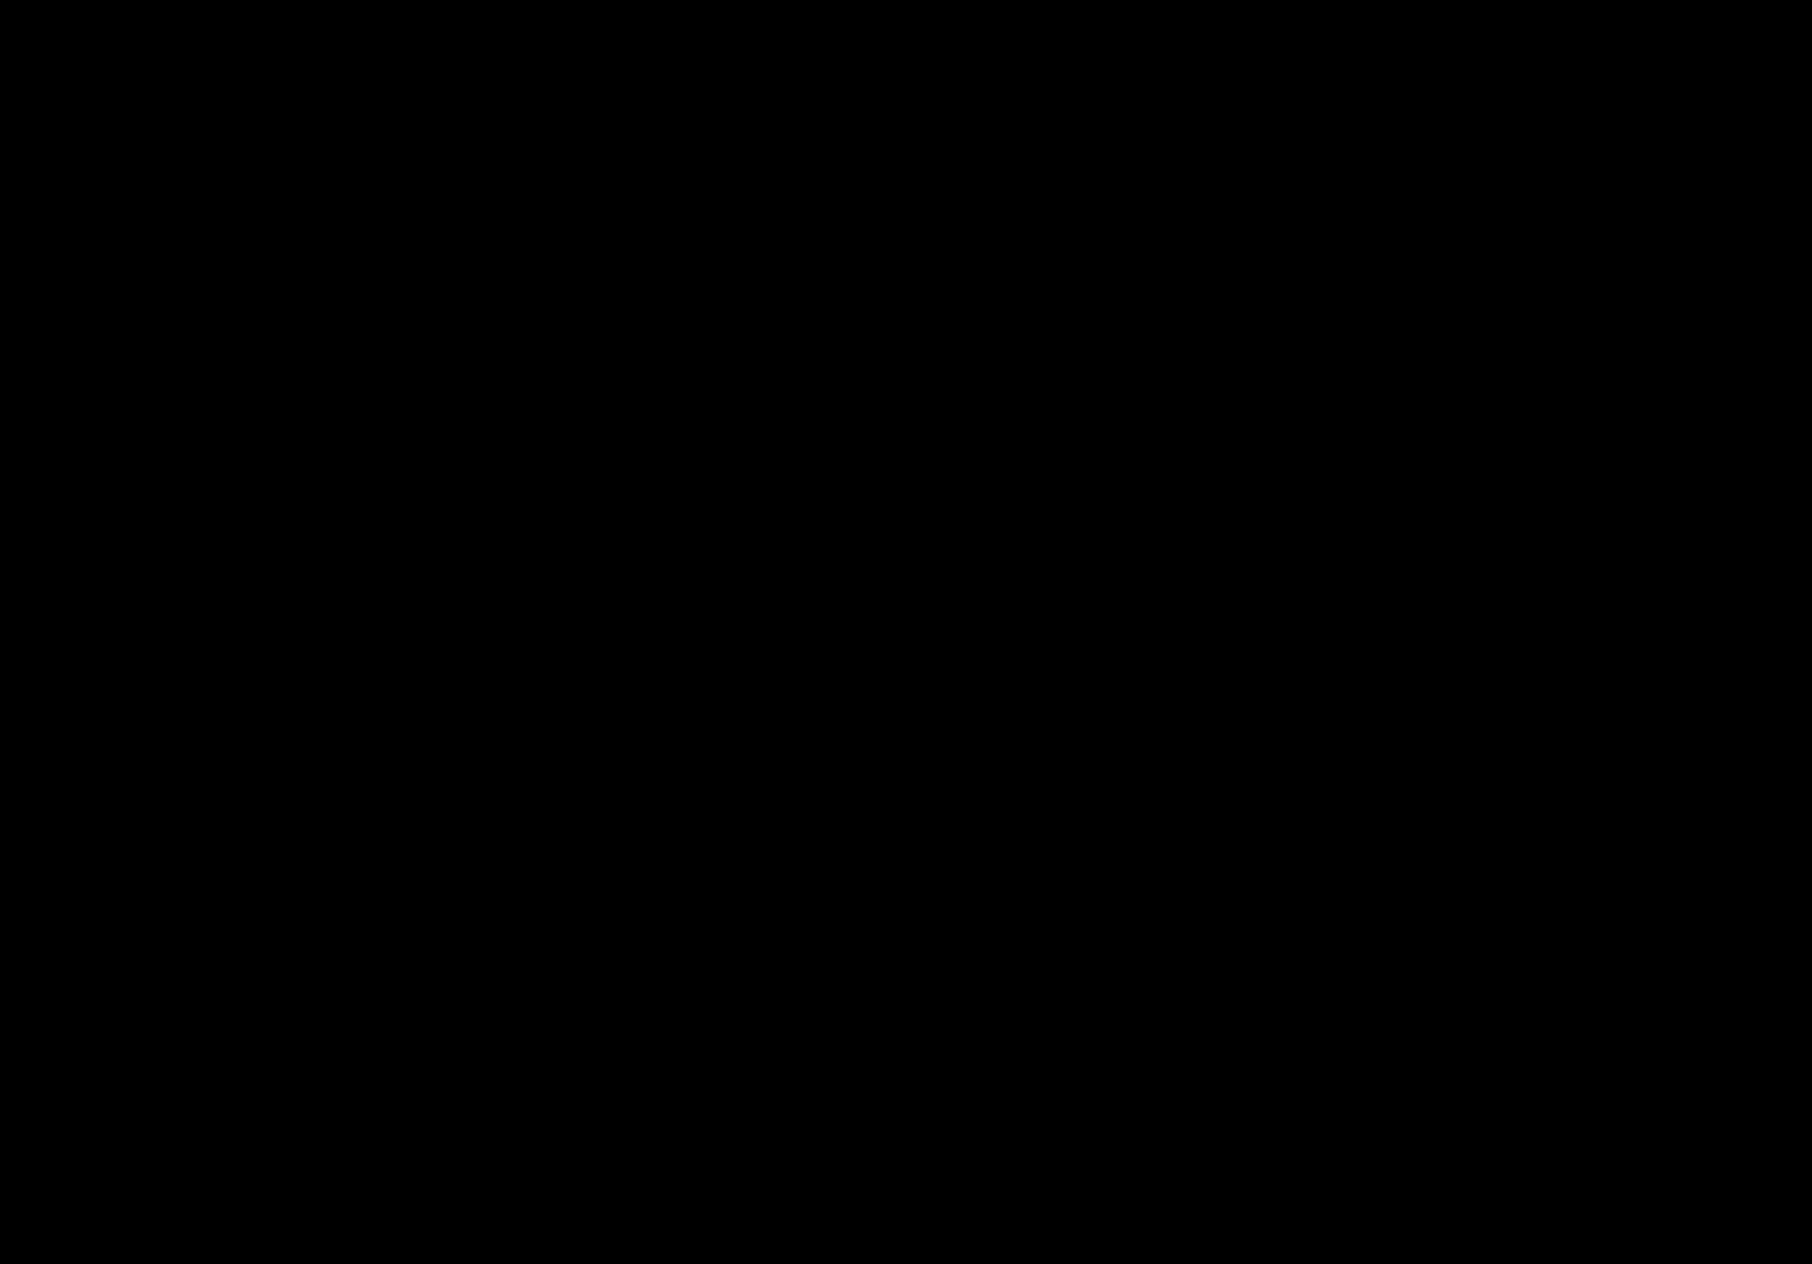 Anipamil HCl